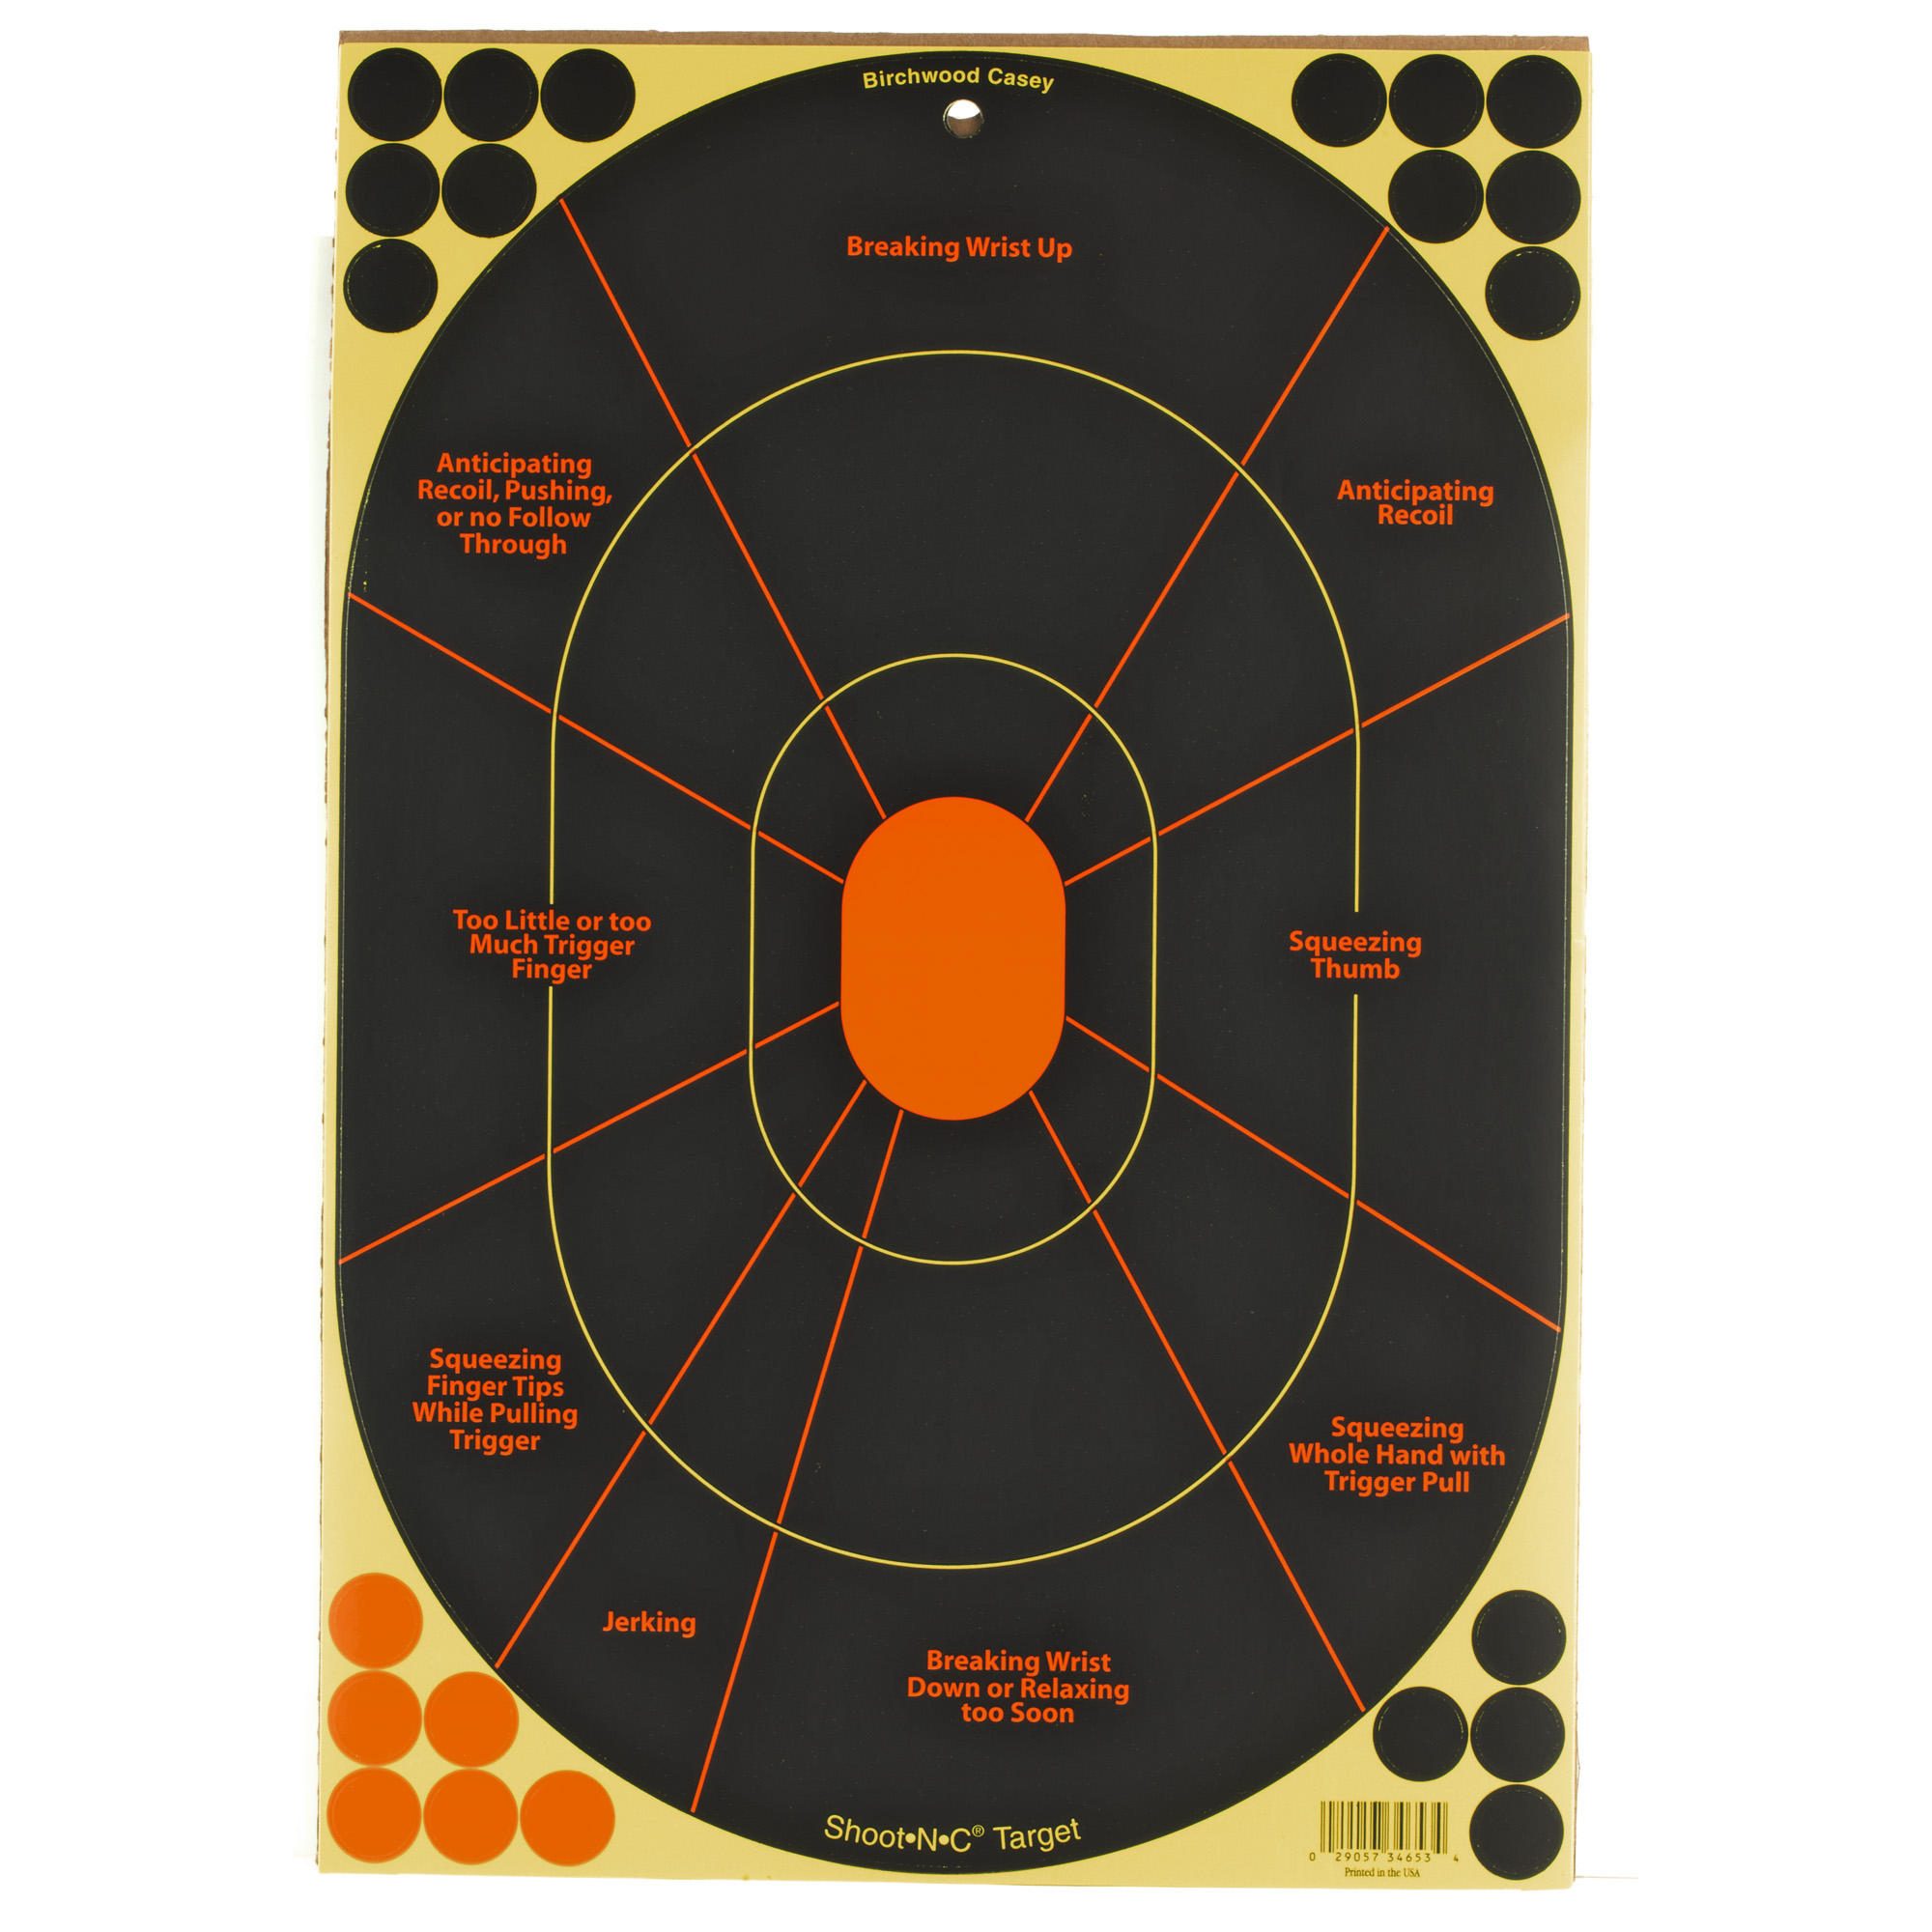 "B/c Sht-n-c Handgun Trnr 5-12x18"""